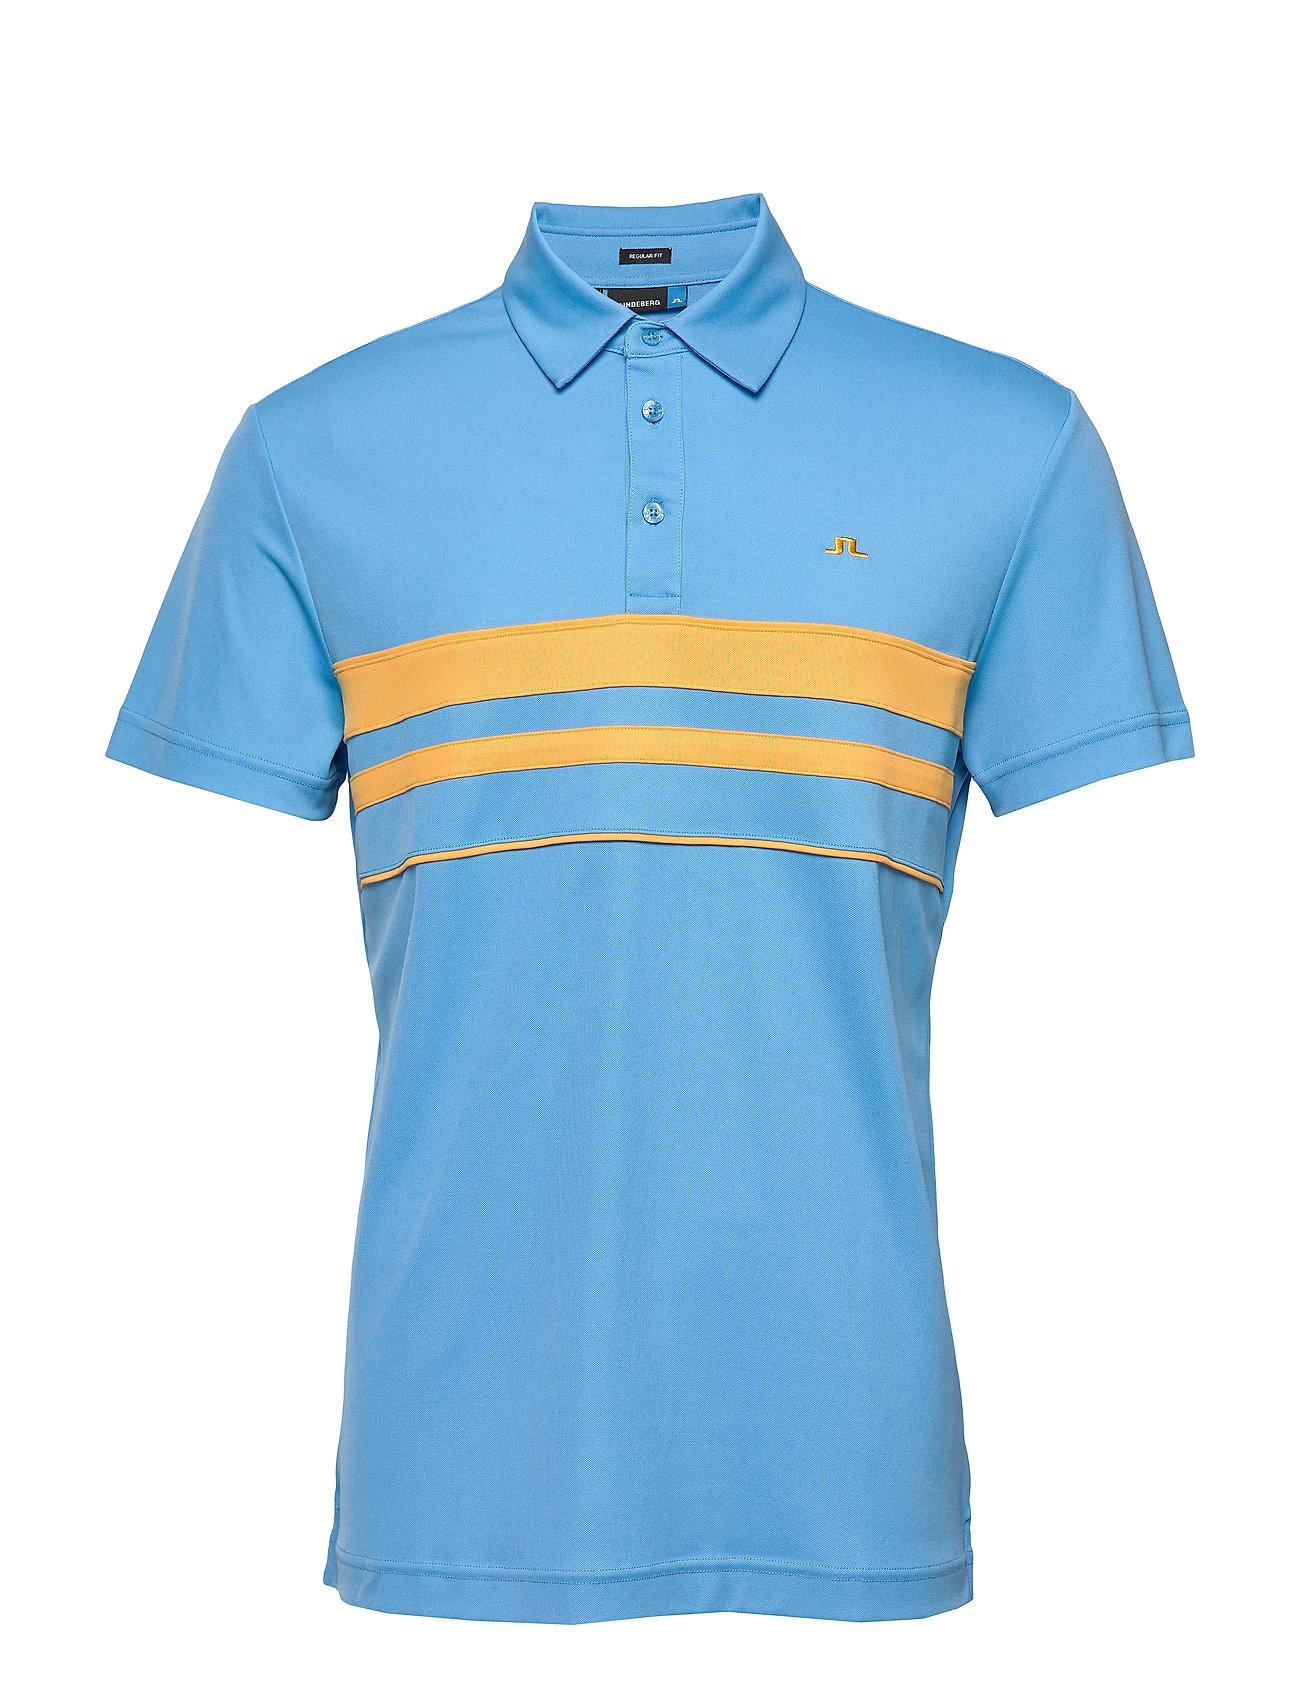 J. Lindeberg Golf M LEO Reg LUX PIQUE - OCEAN BLUE